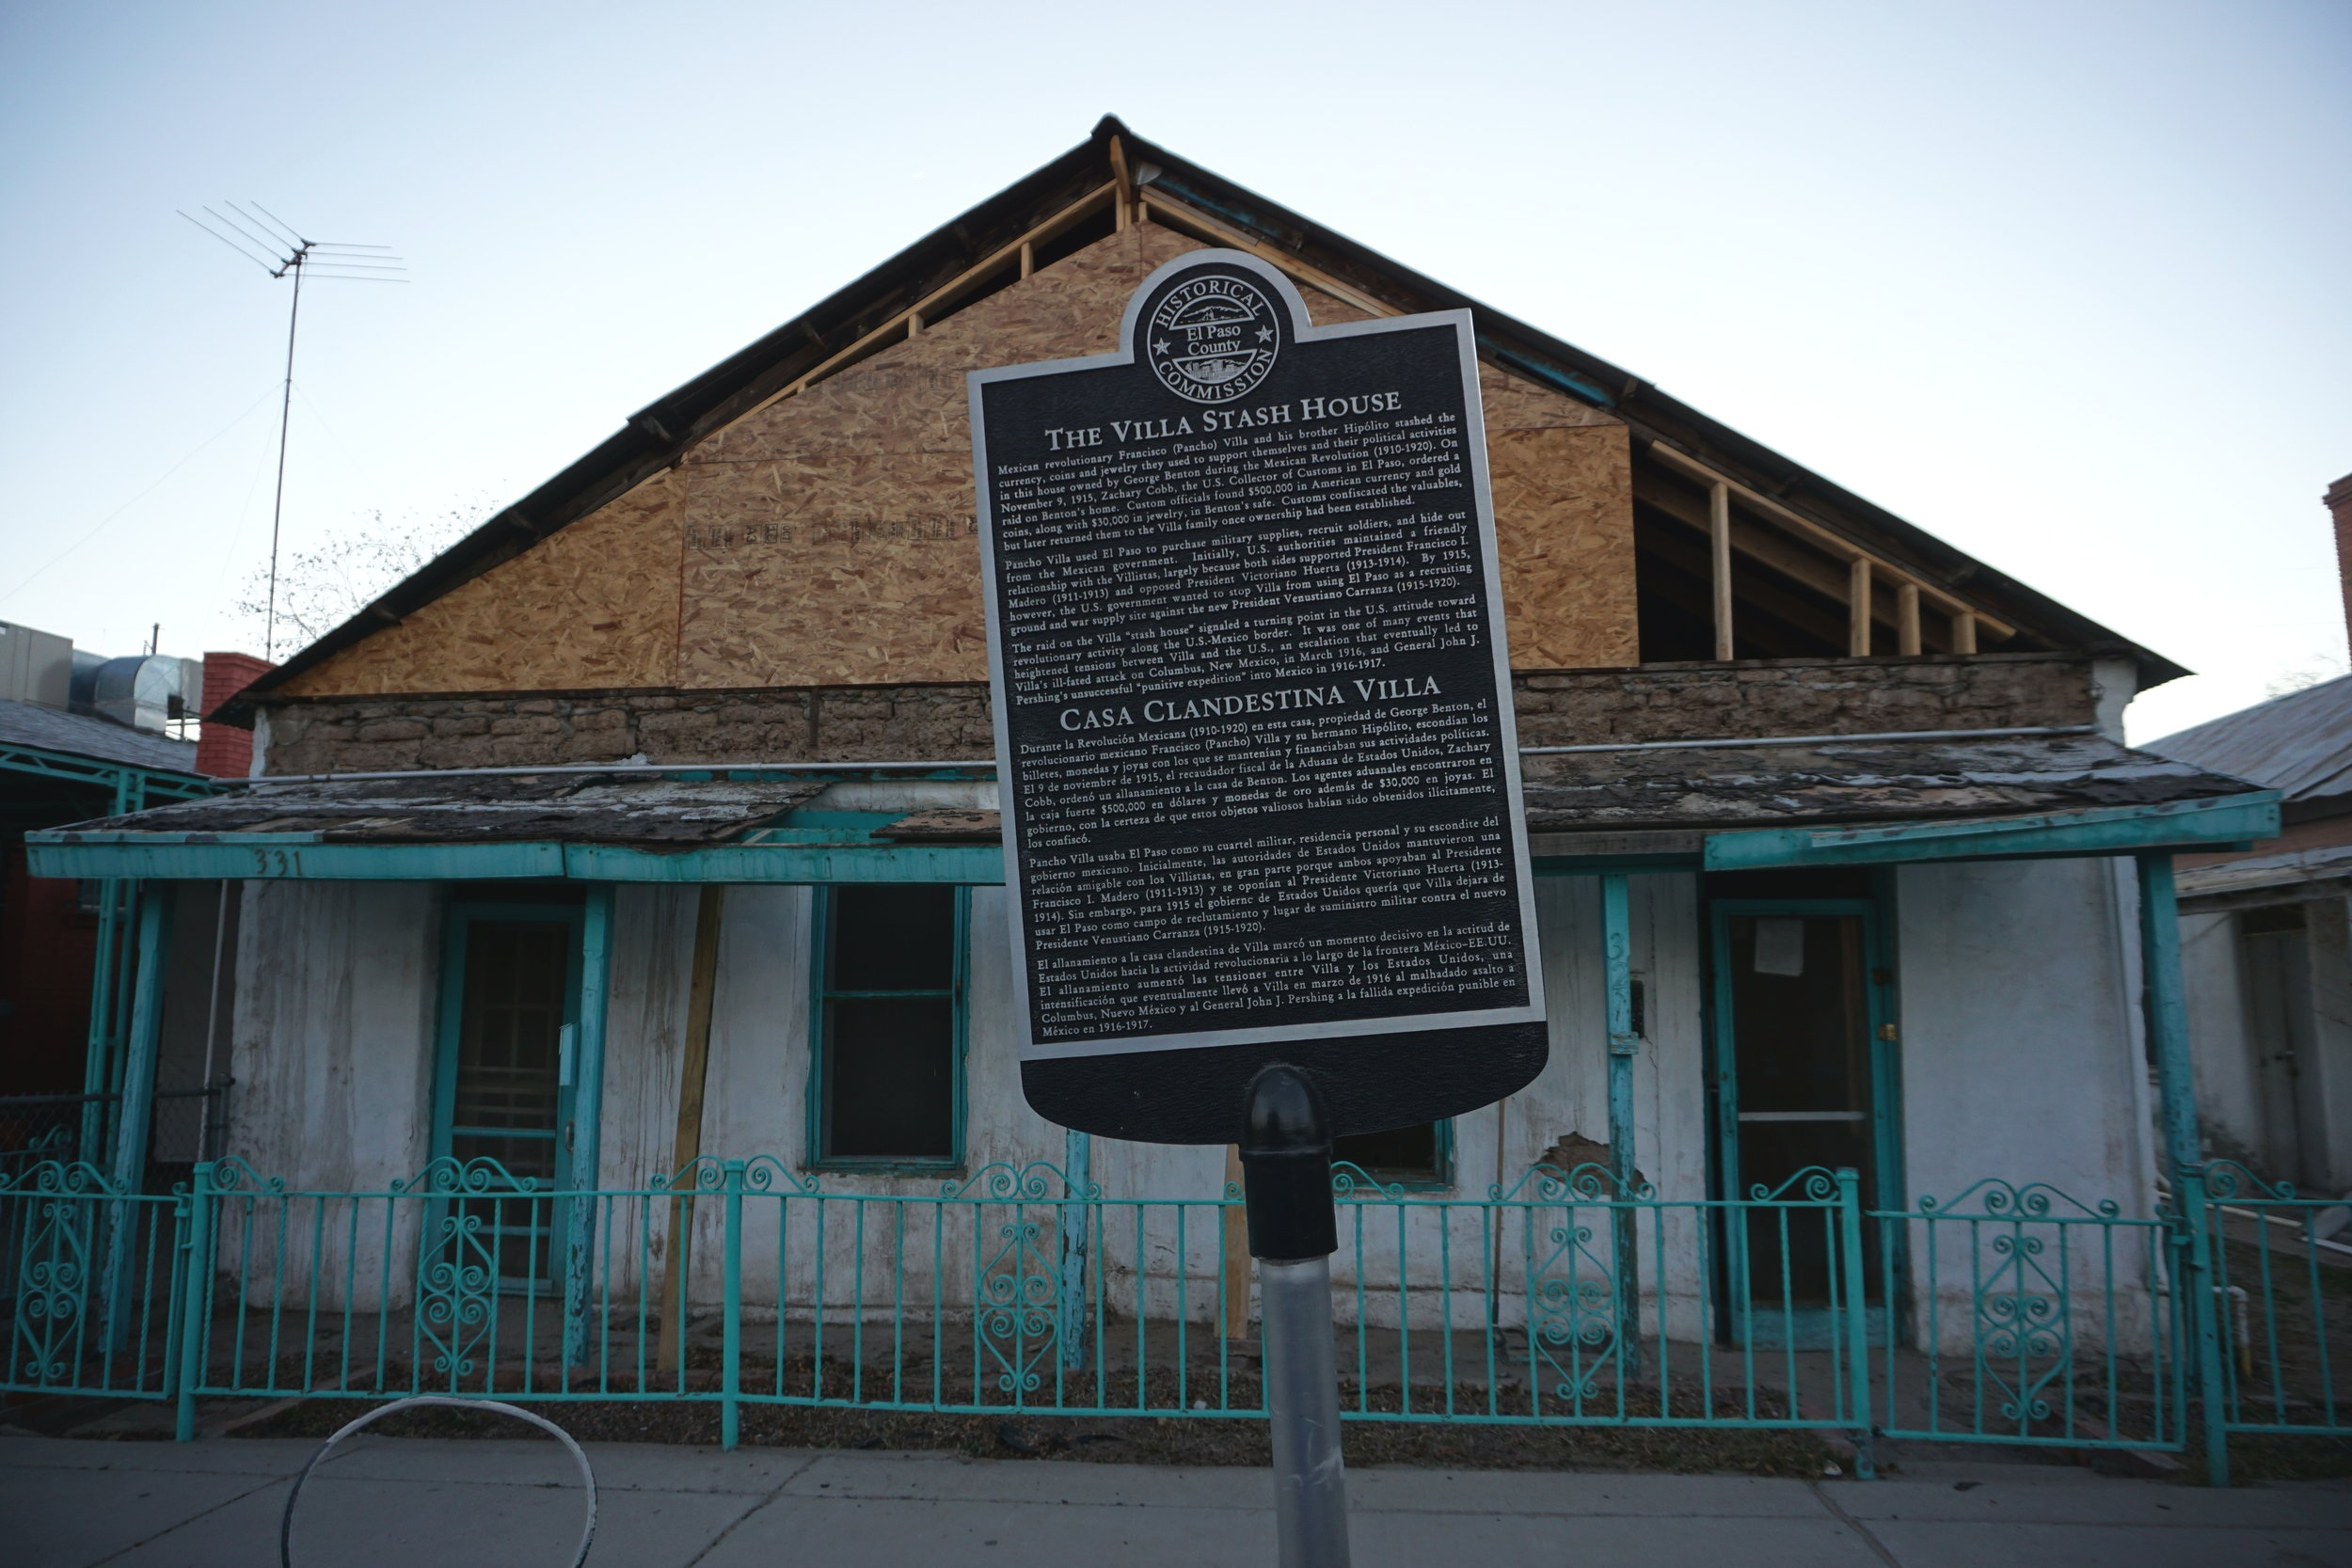 Pancho Villa stash house, El Paso Texas